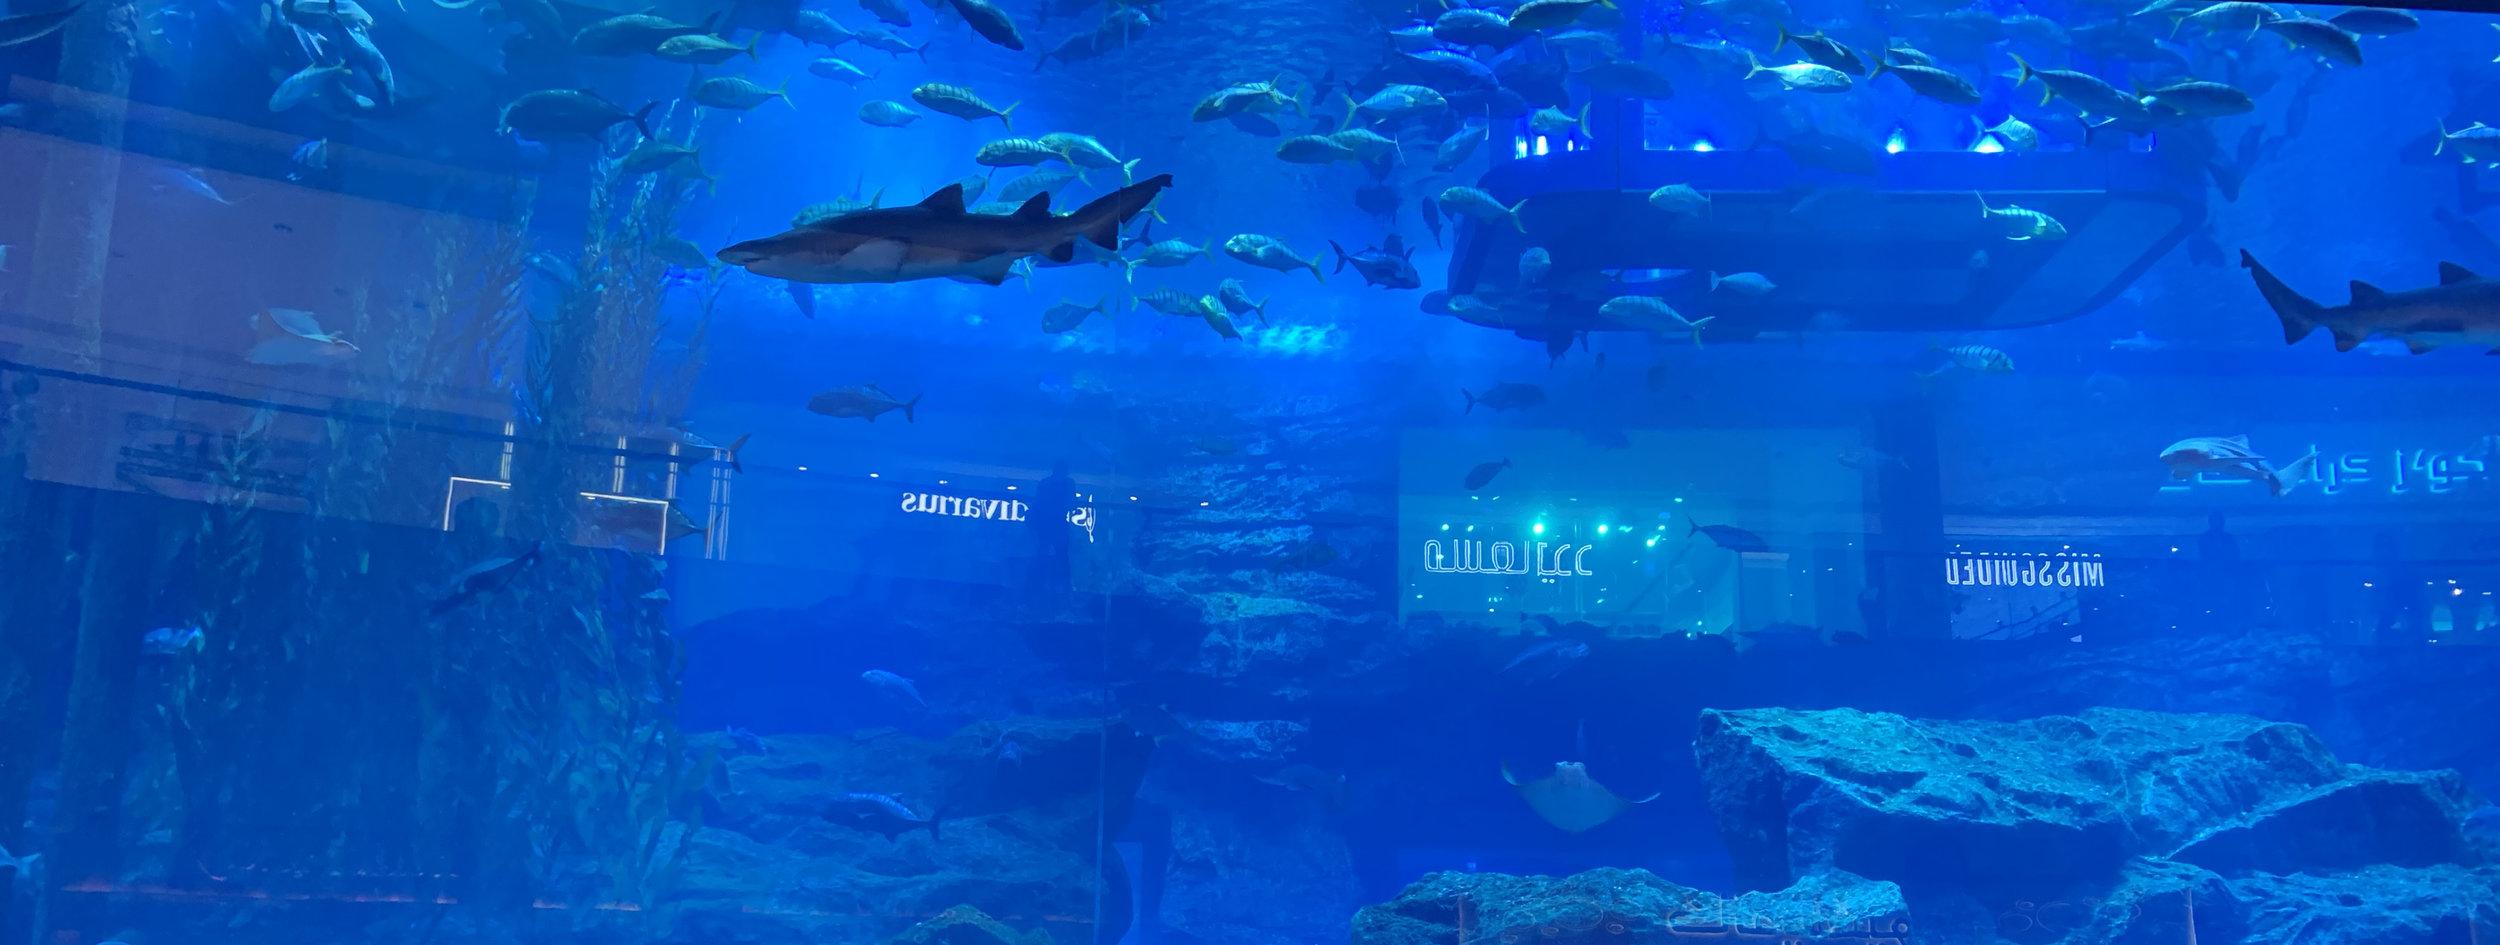 Aquarium inside Dubai Mall